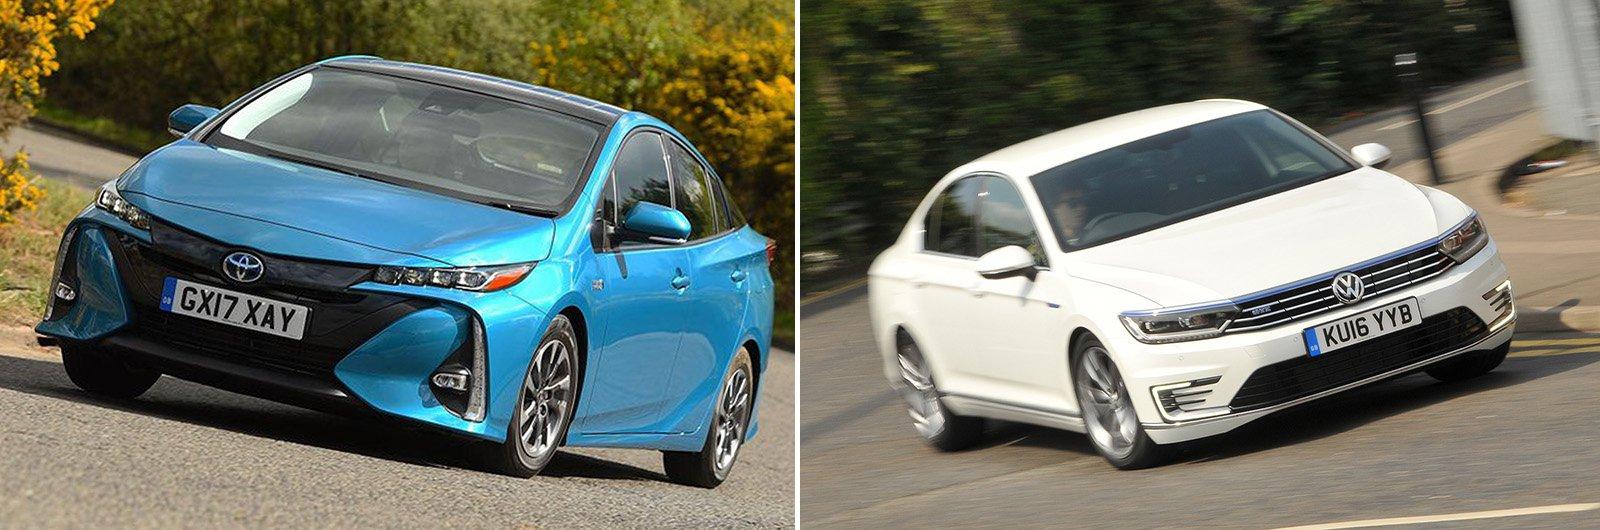 New Toyota Prius Plug-in hybrid vs used Volkswagen Passat GTE